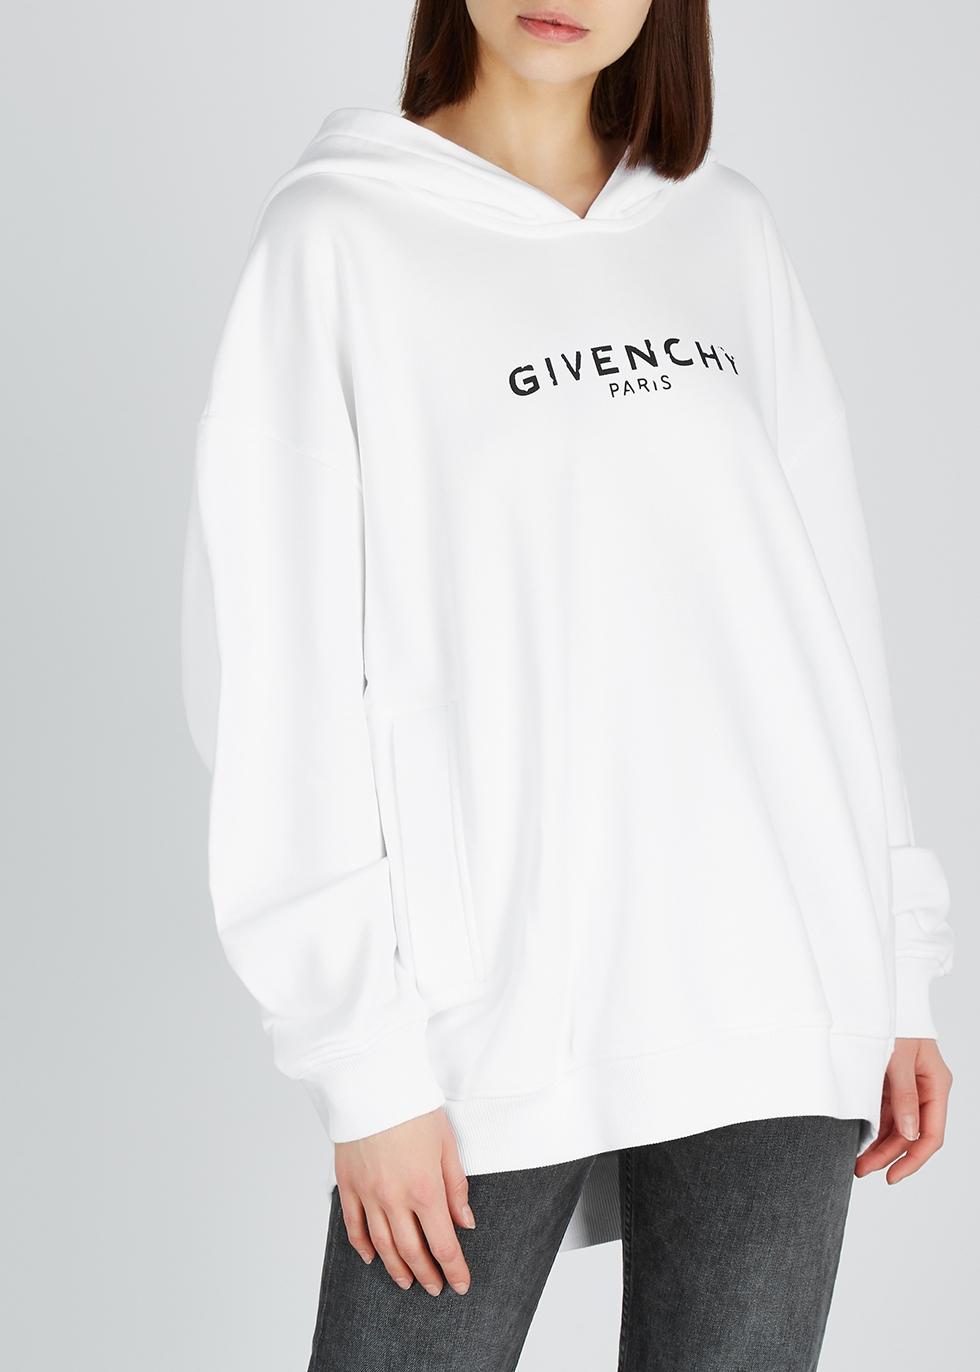 Logo-print hooded cotton sweatshirt - Givenchy